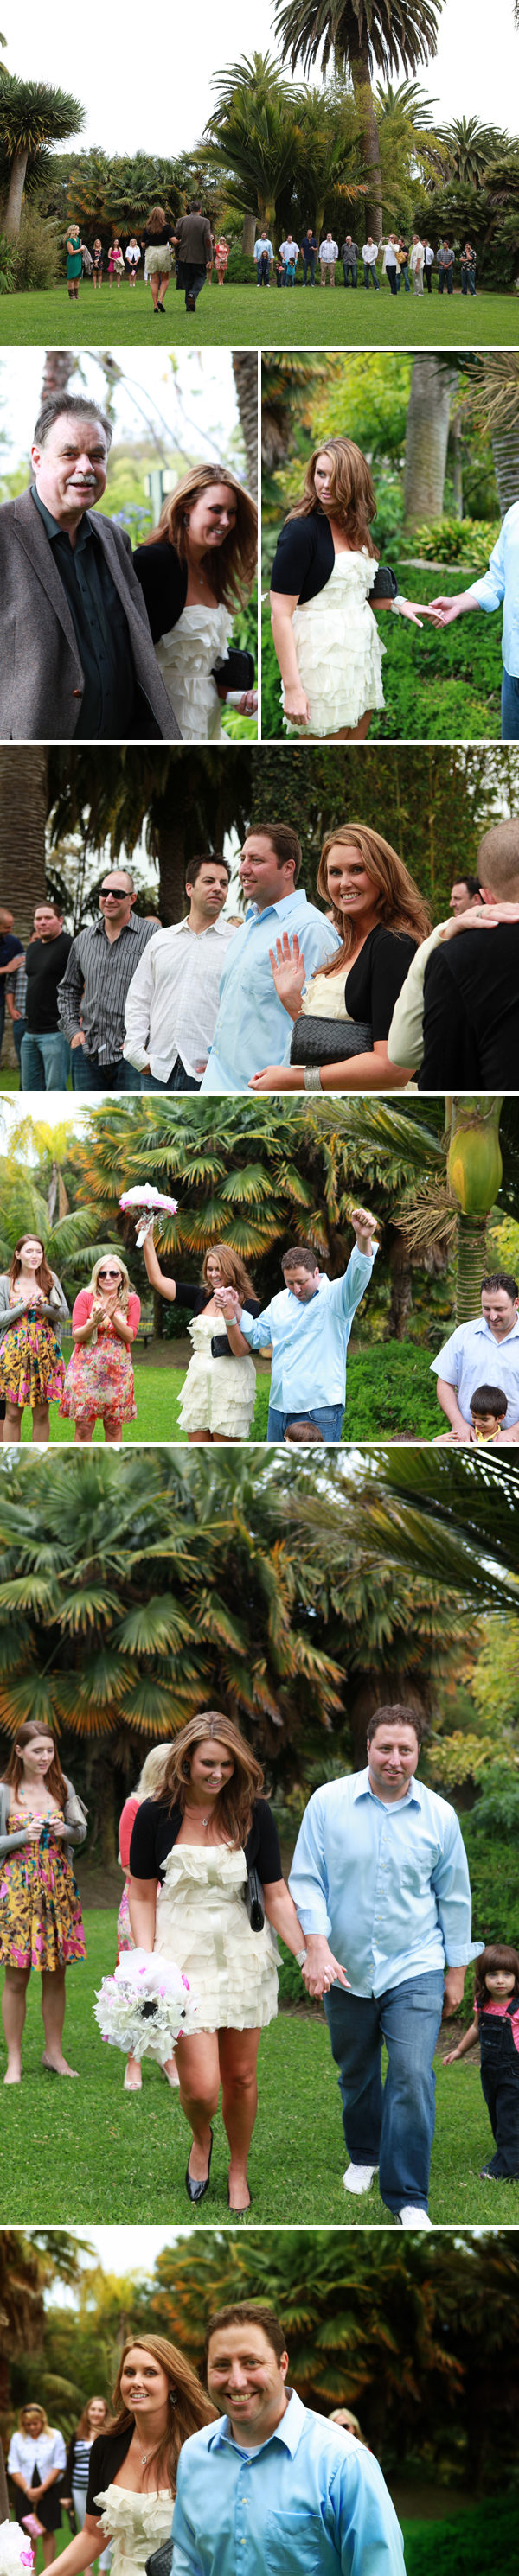 Studio 11 Wedding Photography Santa Barbara